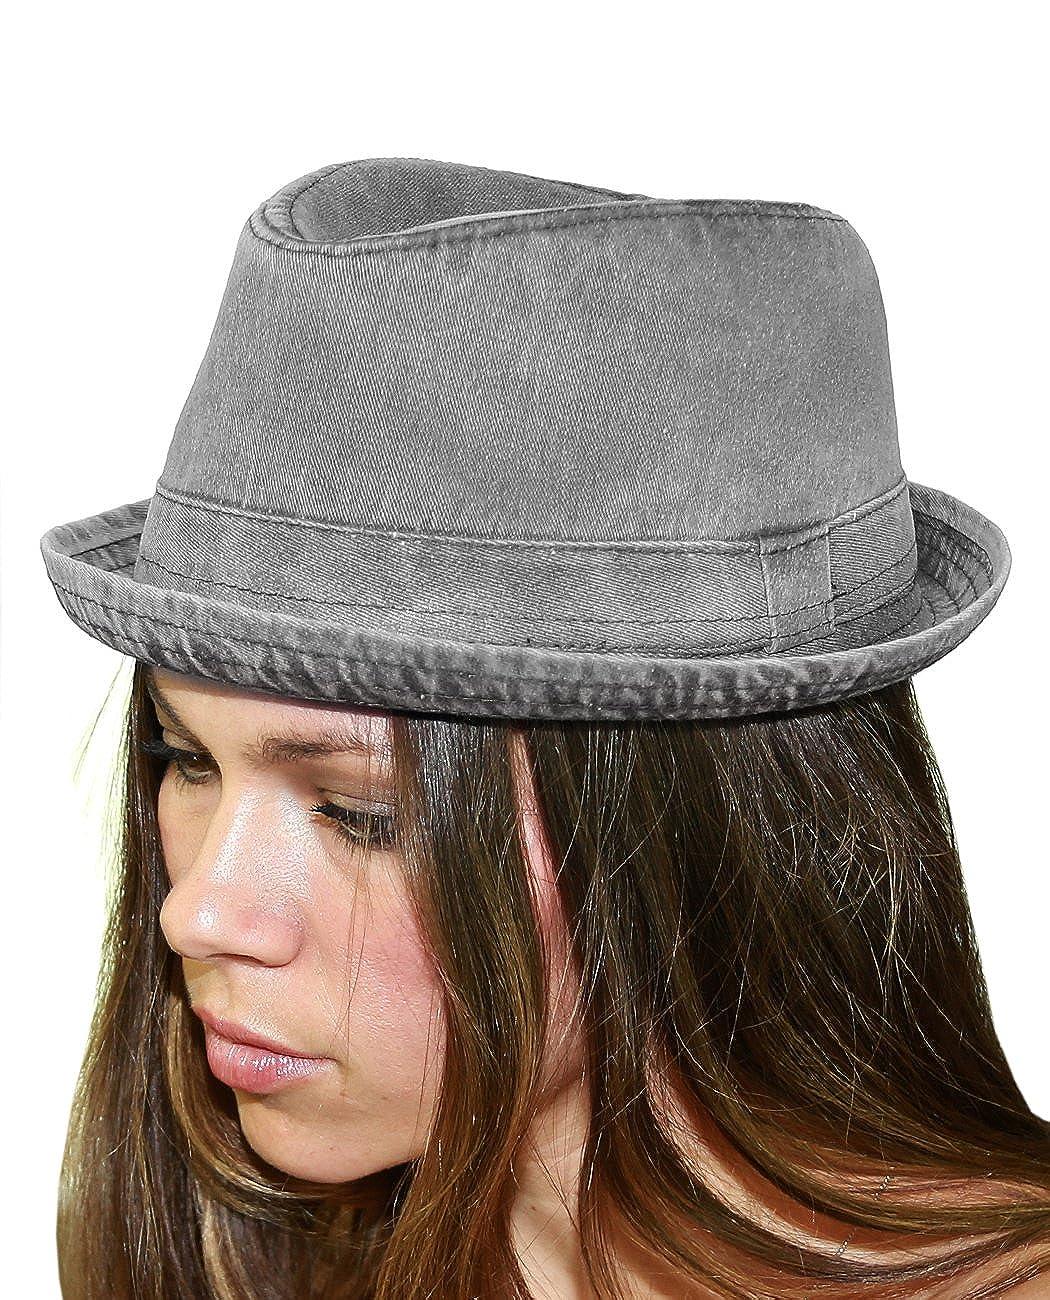 NYFASHION101 Classic Lightweight Cotton Unisex Trilby Fedora Hat